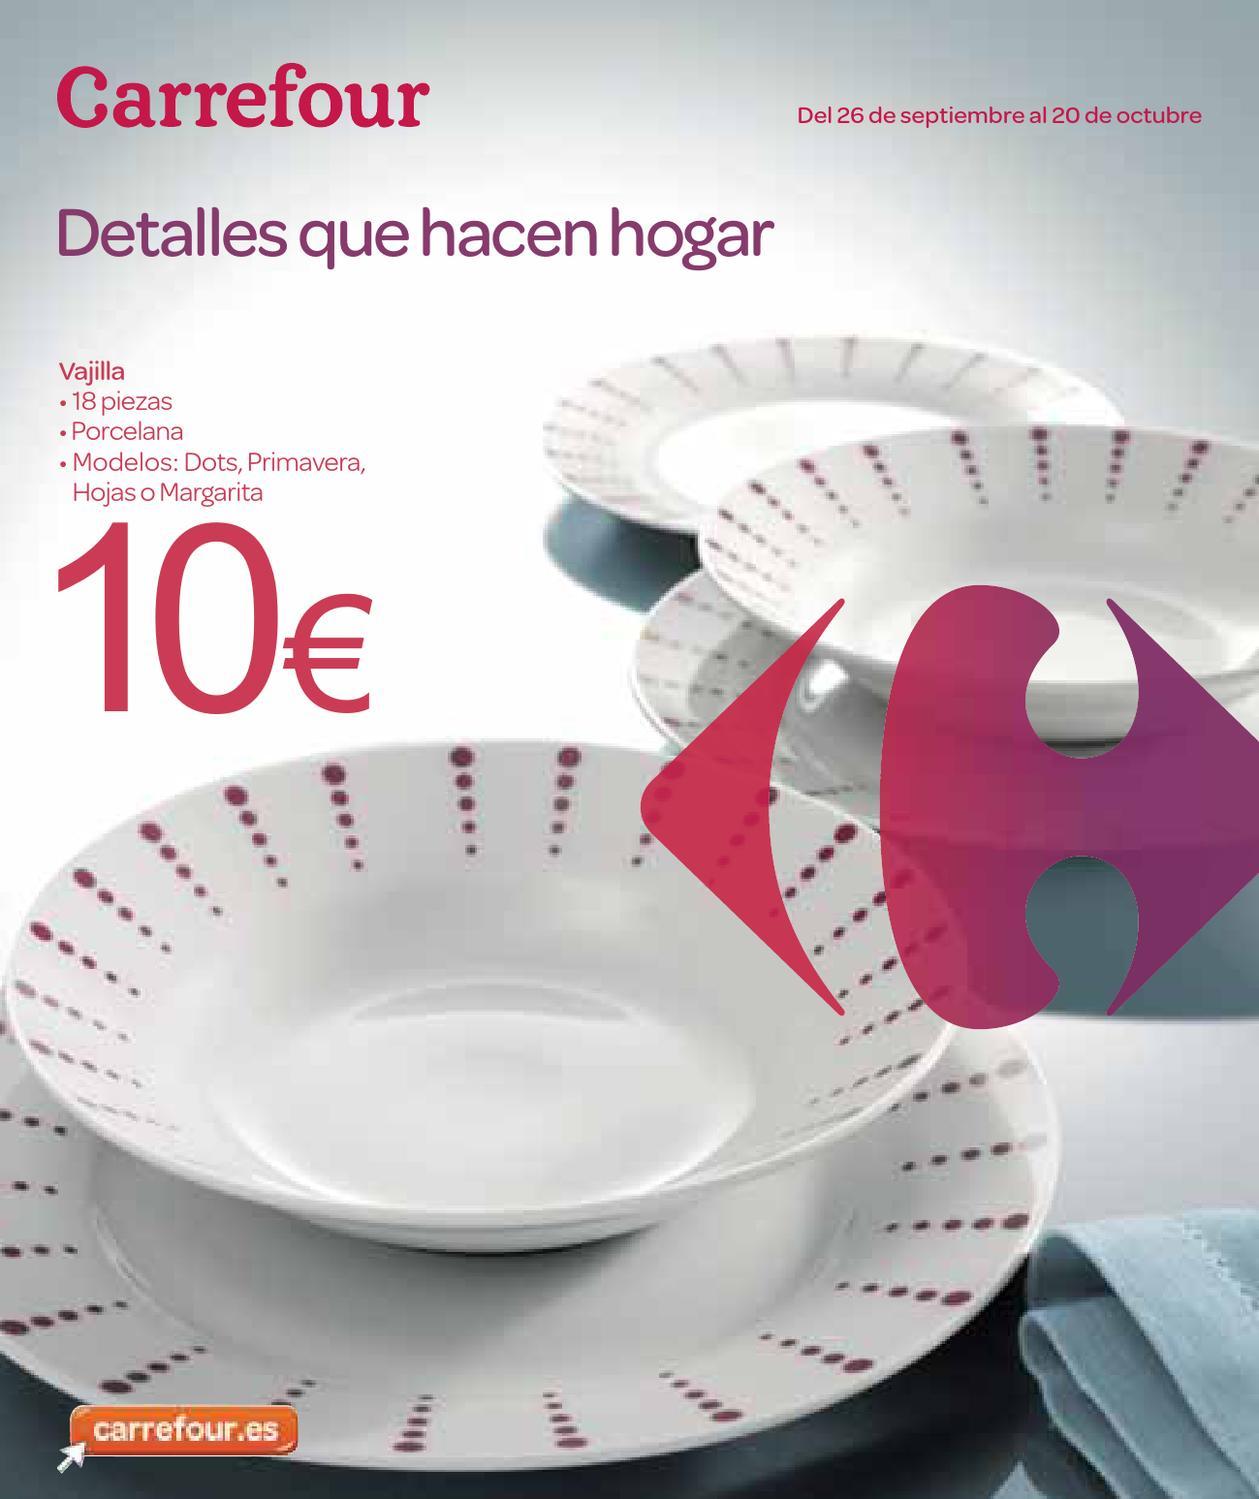 Accesorios De Baño Carrefour:catalogo carrefour electrodomesticos y menaje by Milyuncatalogoscom